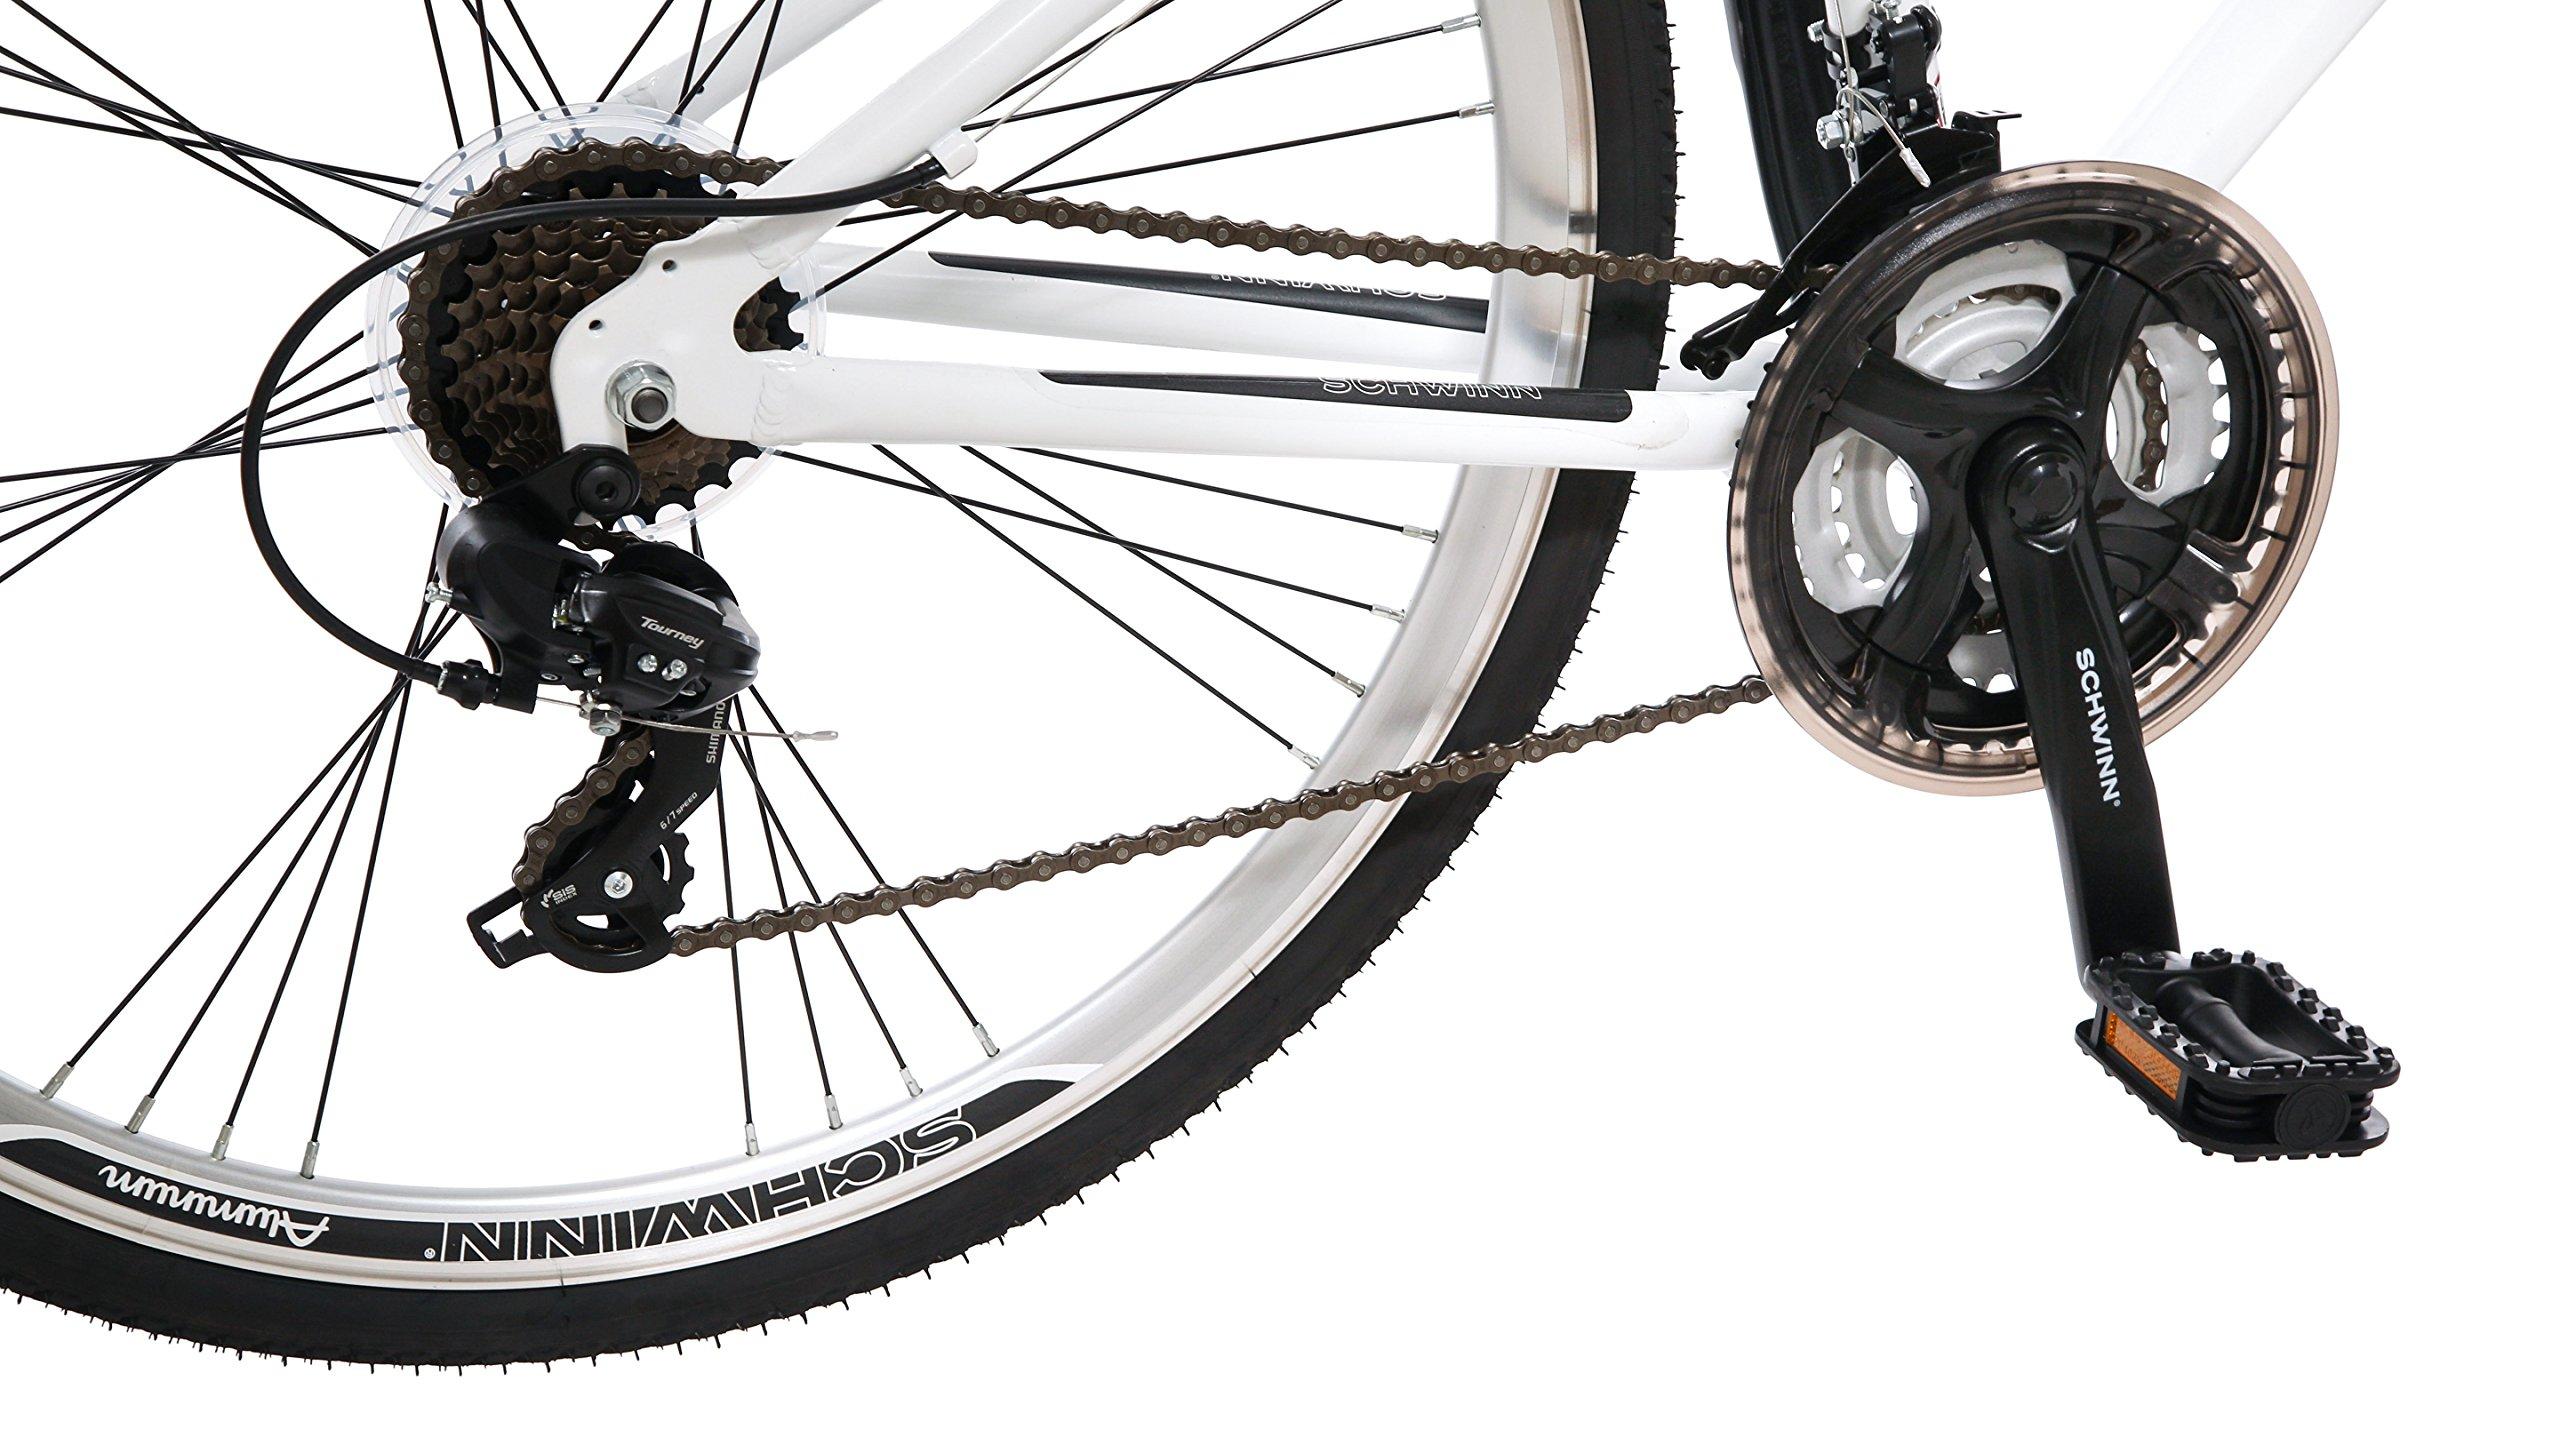 Schwinn Men's Network 3.0 700C Wheel Men's Hybrid Bicycle White, 18' Frame size by Schwinn (Image #5)